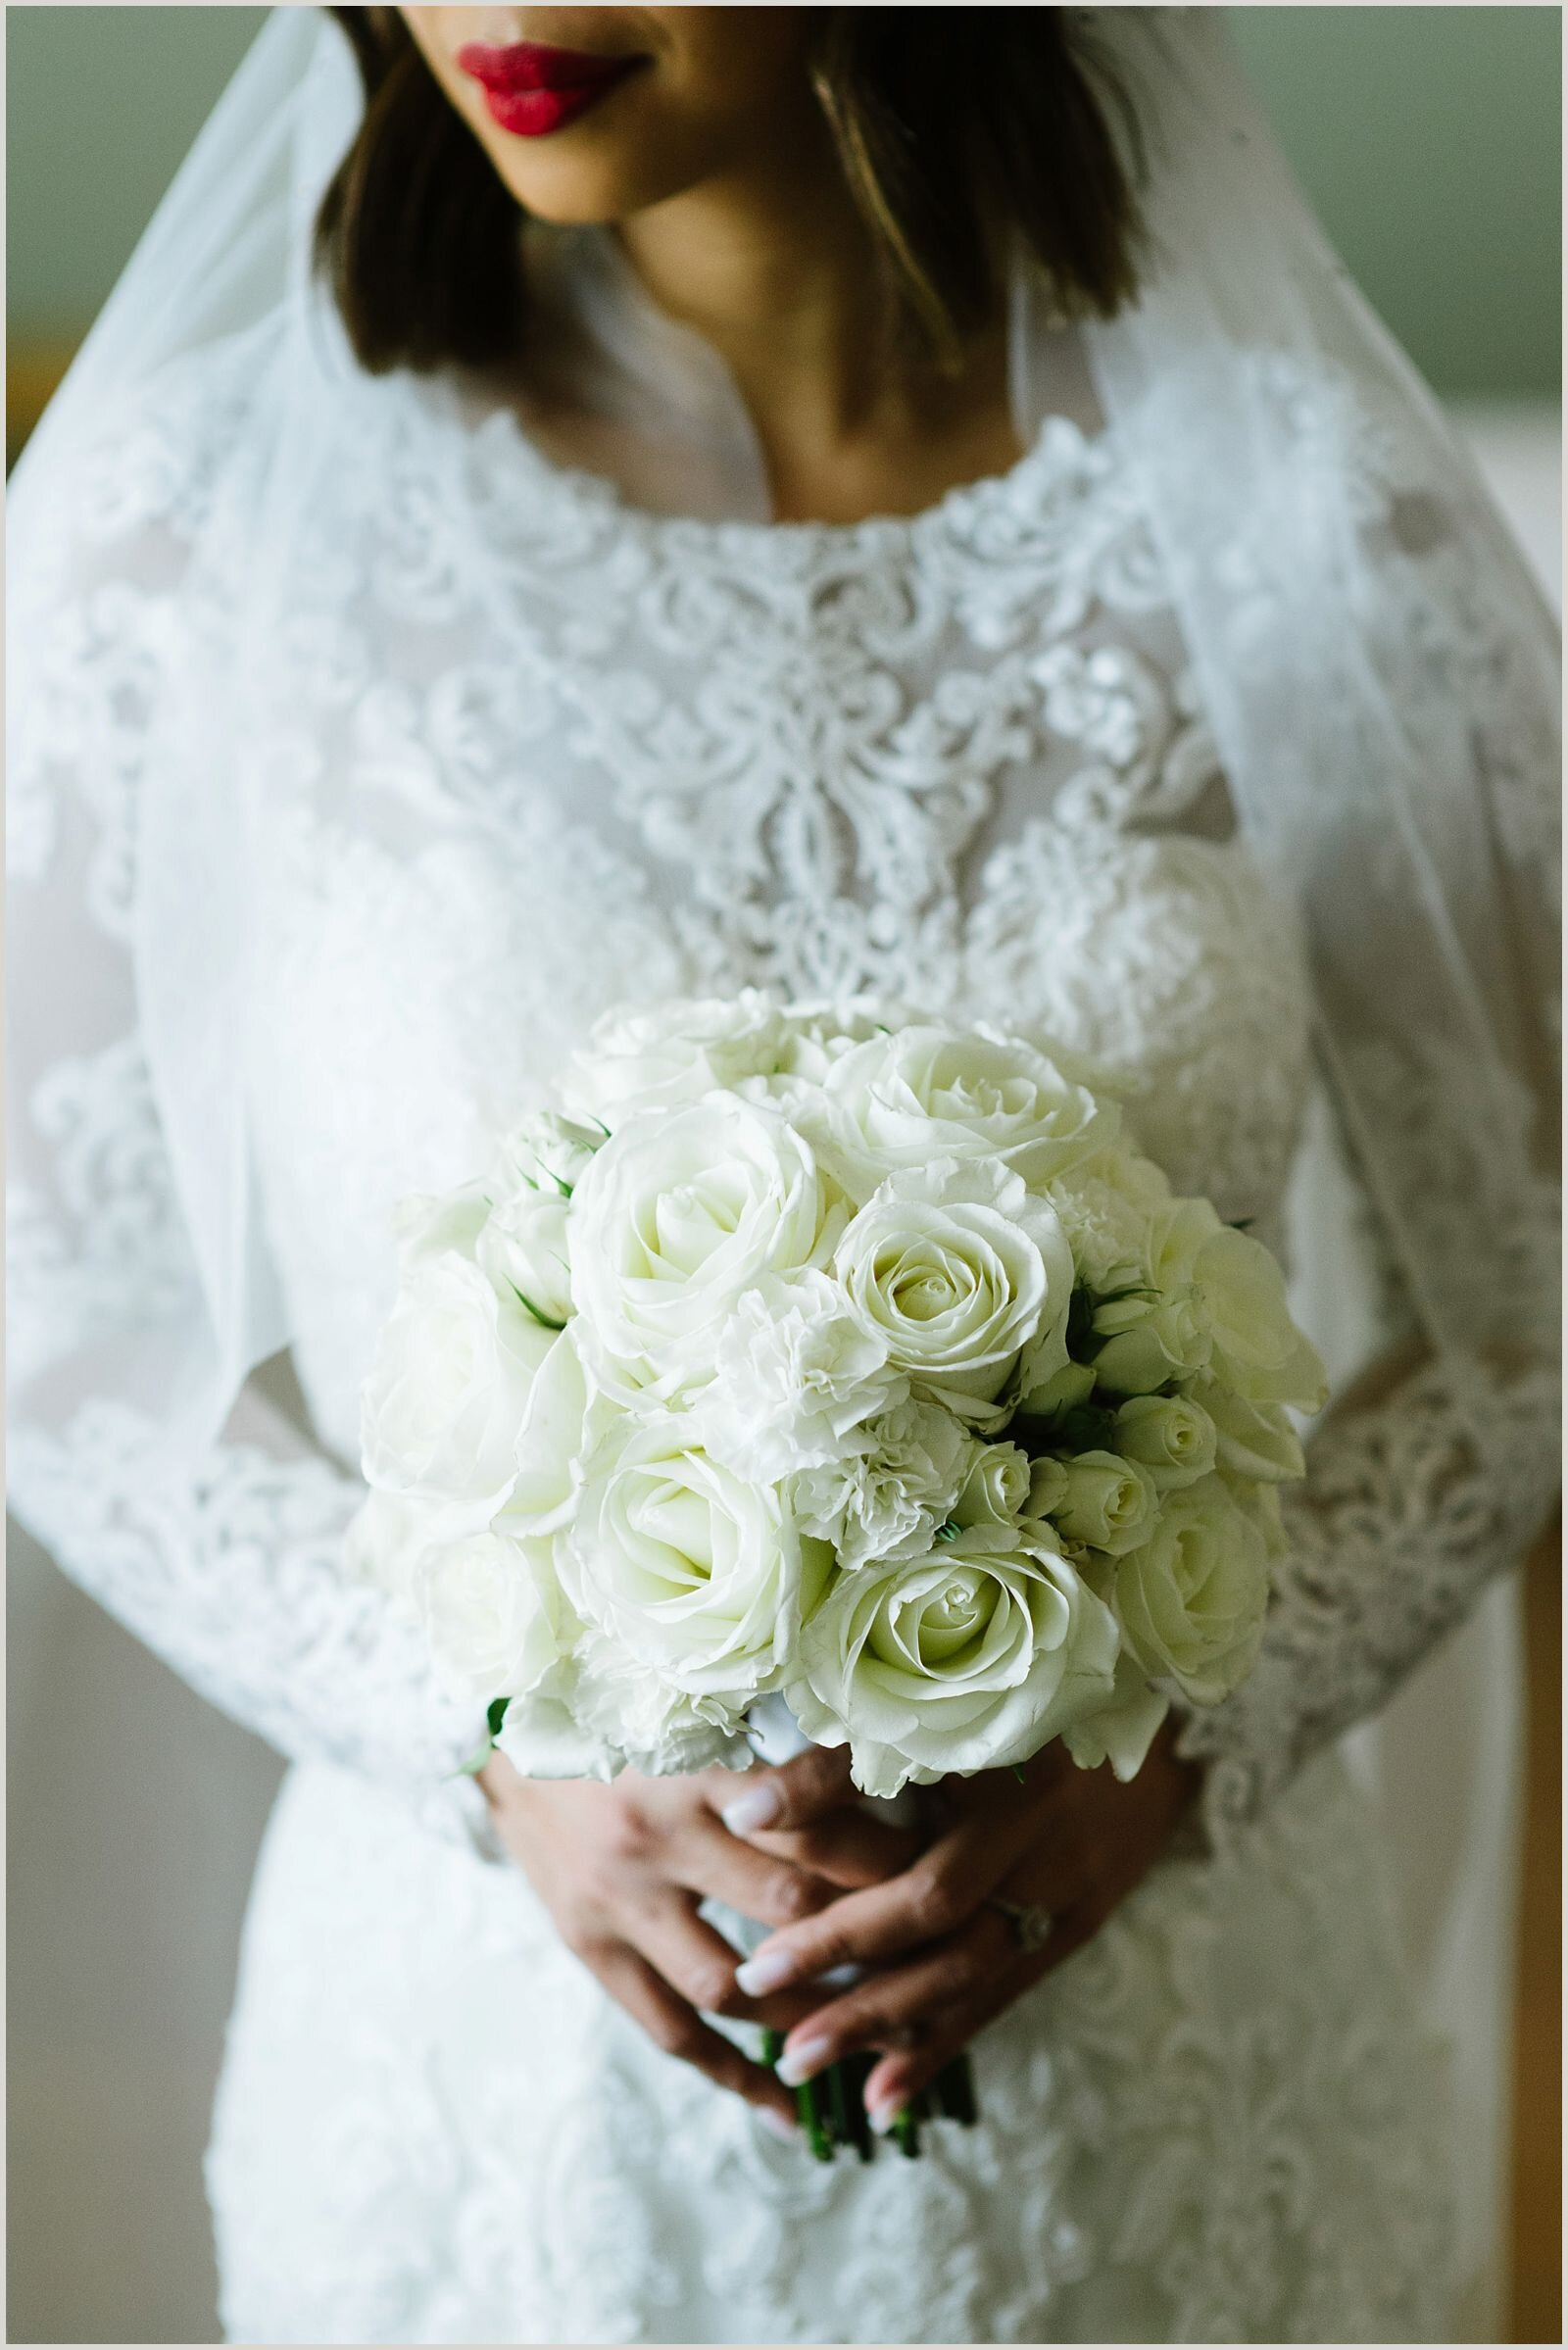 joseph_koprek_wedding_melbourne_the_prince_deck_0009.jpg